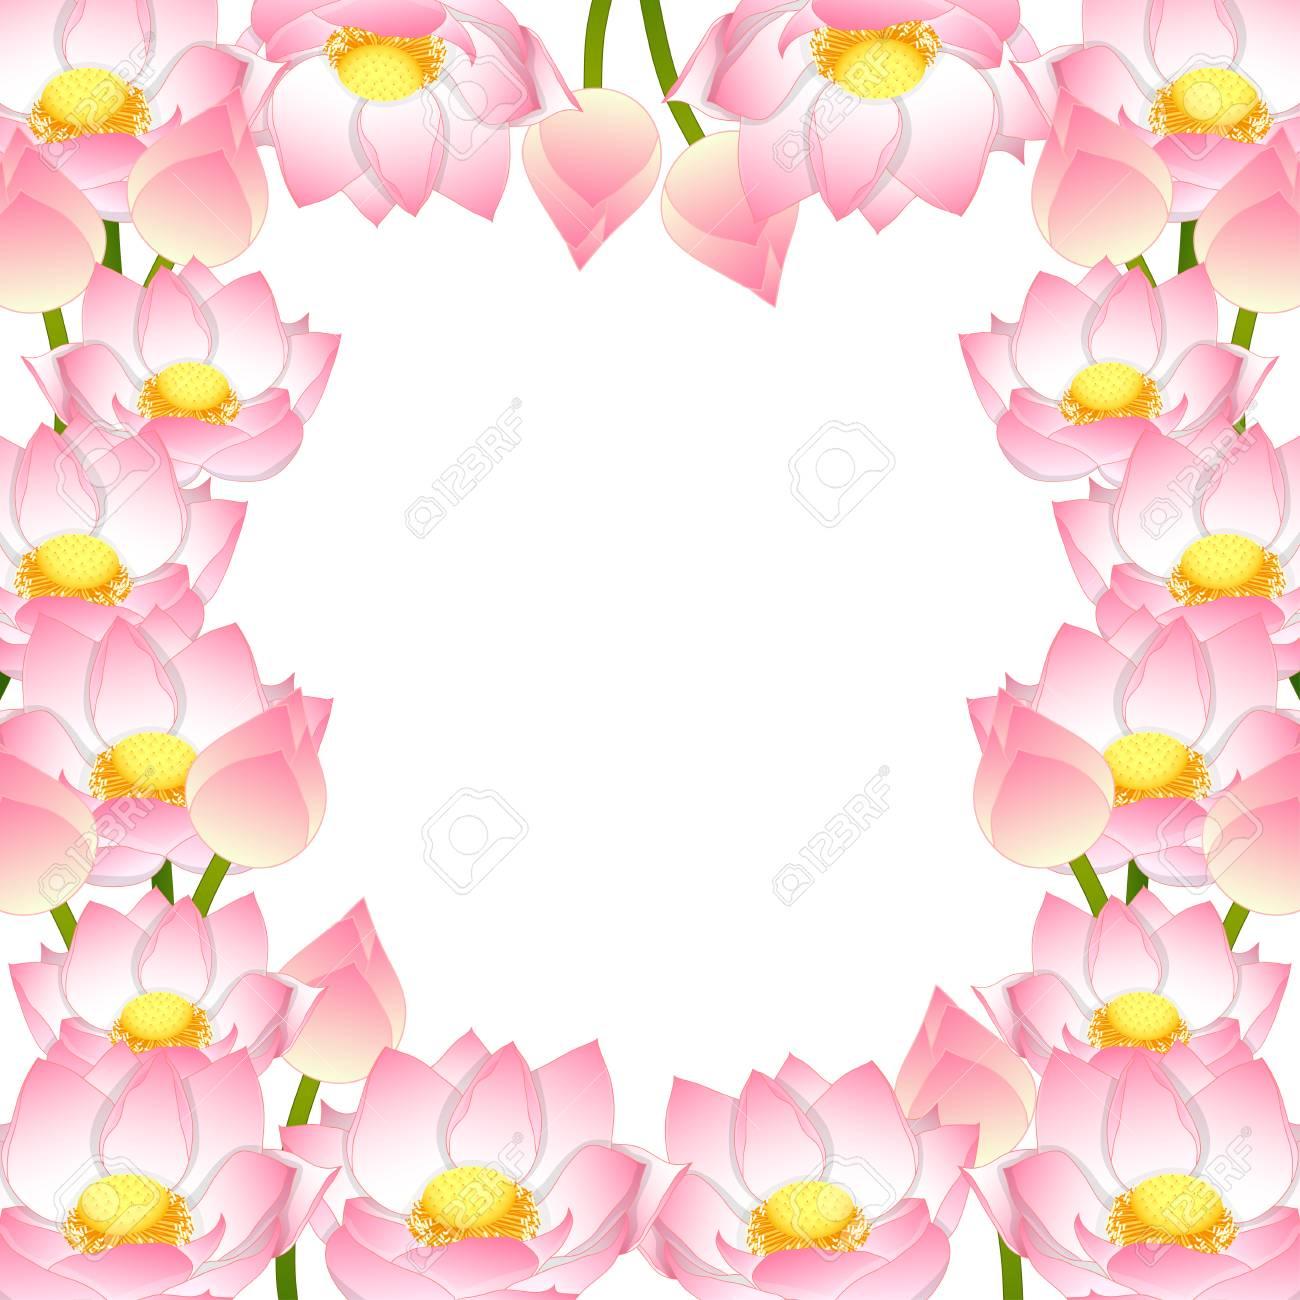 Nelumbo Nucifera Indian Lotus Border Sacred Lotus Bean Of